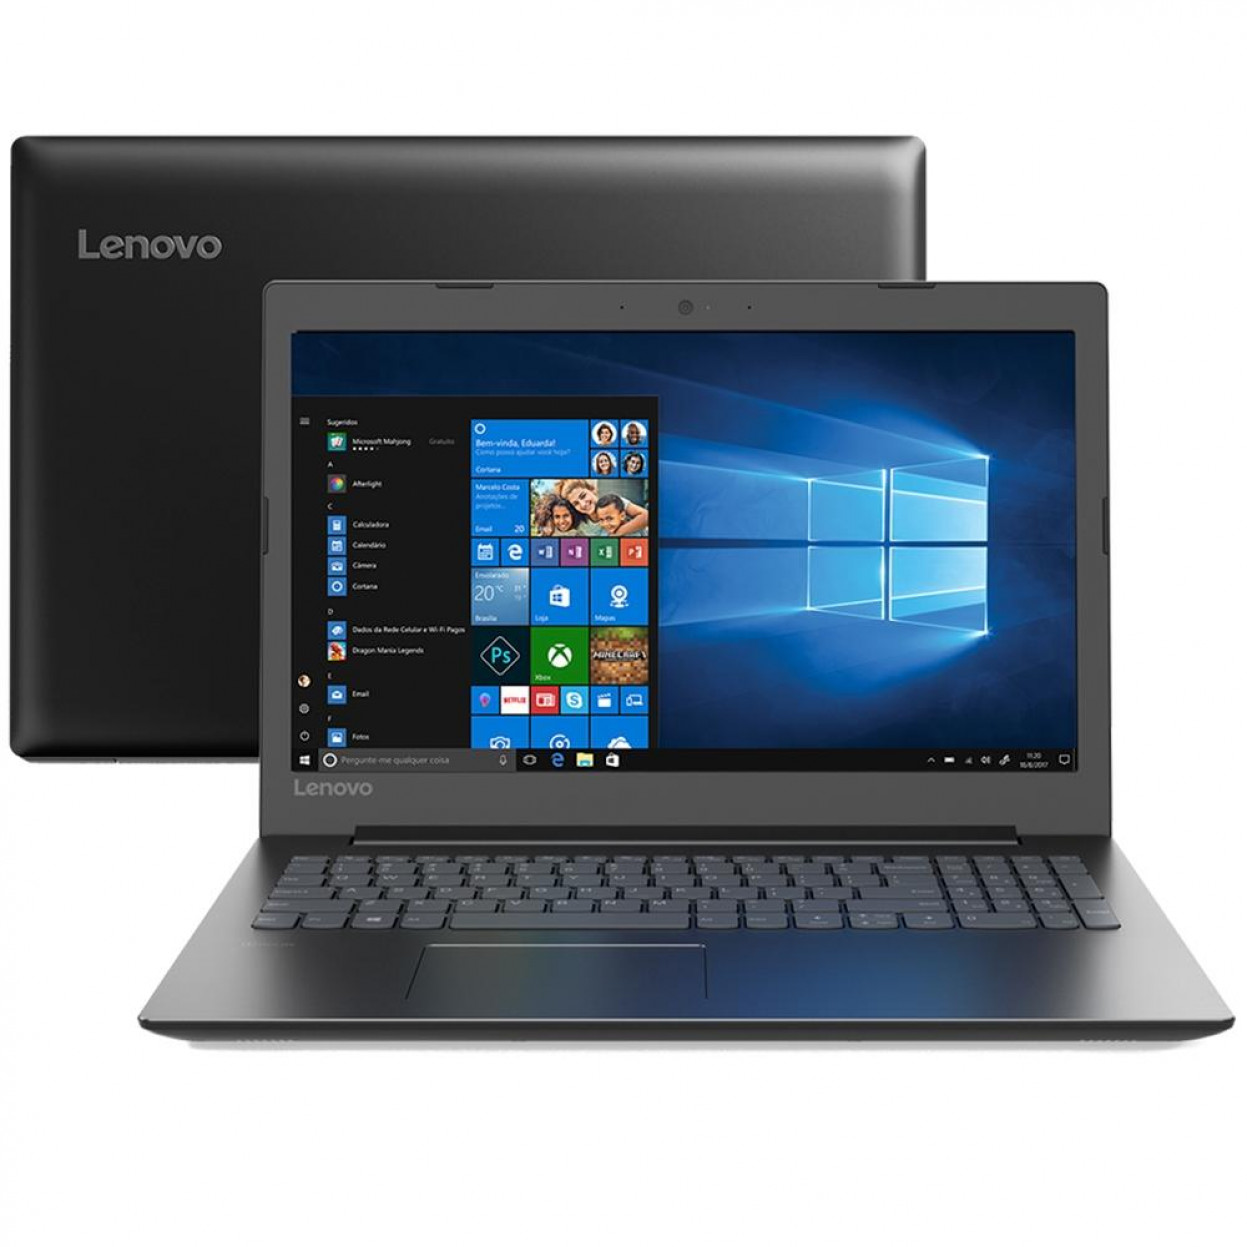 Notebook Lenovo B330 Core I5 8250u Memoria 4gb Ddr4 Ssd 480gb Tela 15.6' Fhd Windows 10 Home